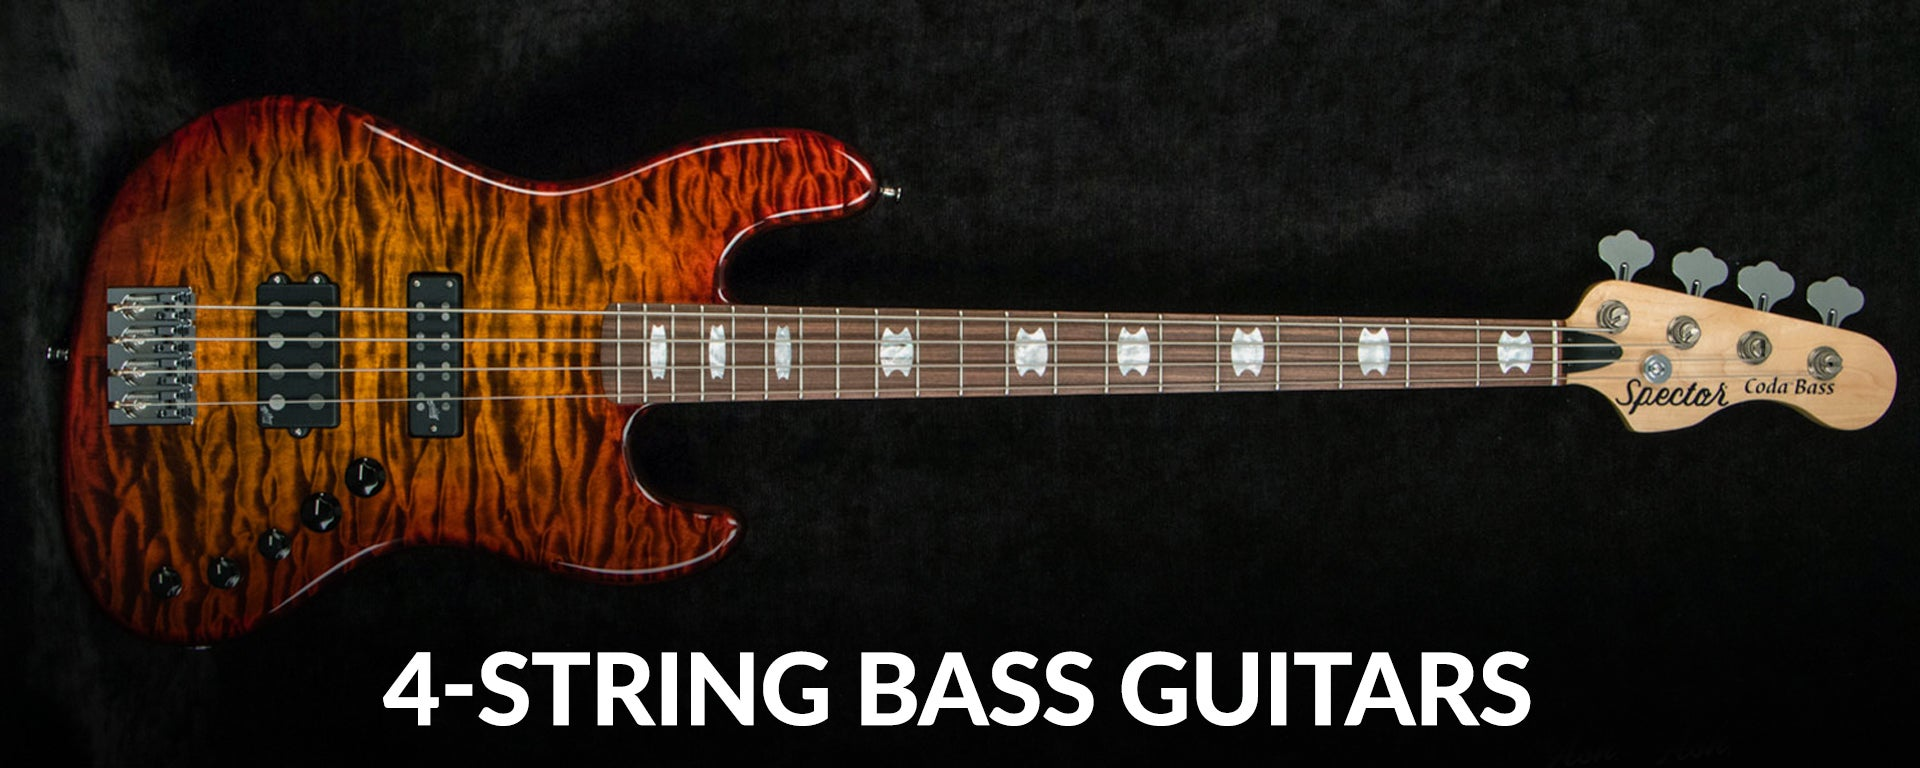 Shop 4-string electric bass guitars at Sam Ash